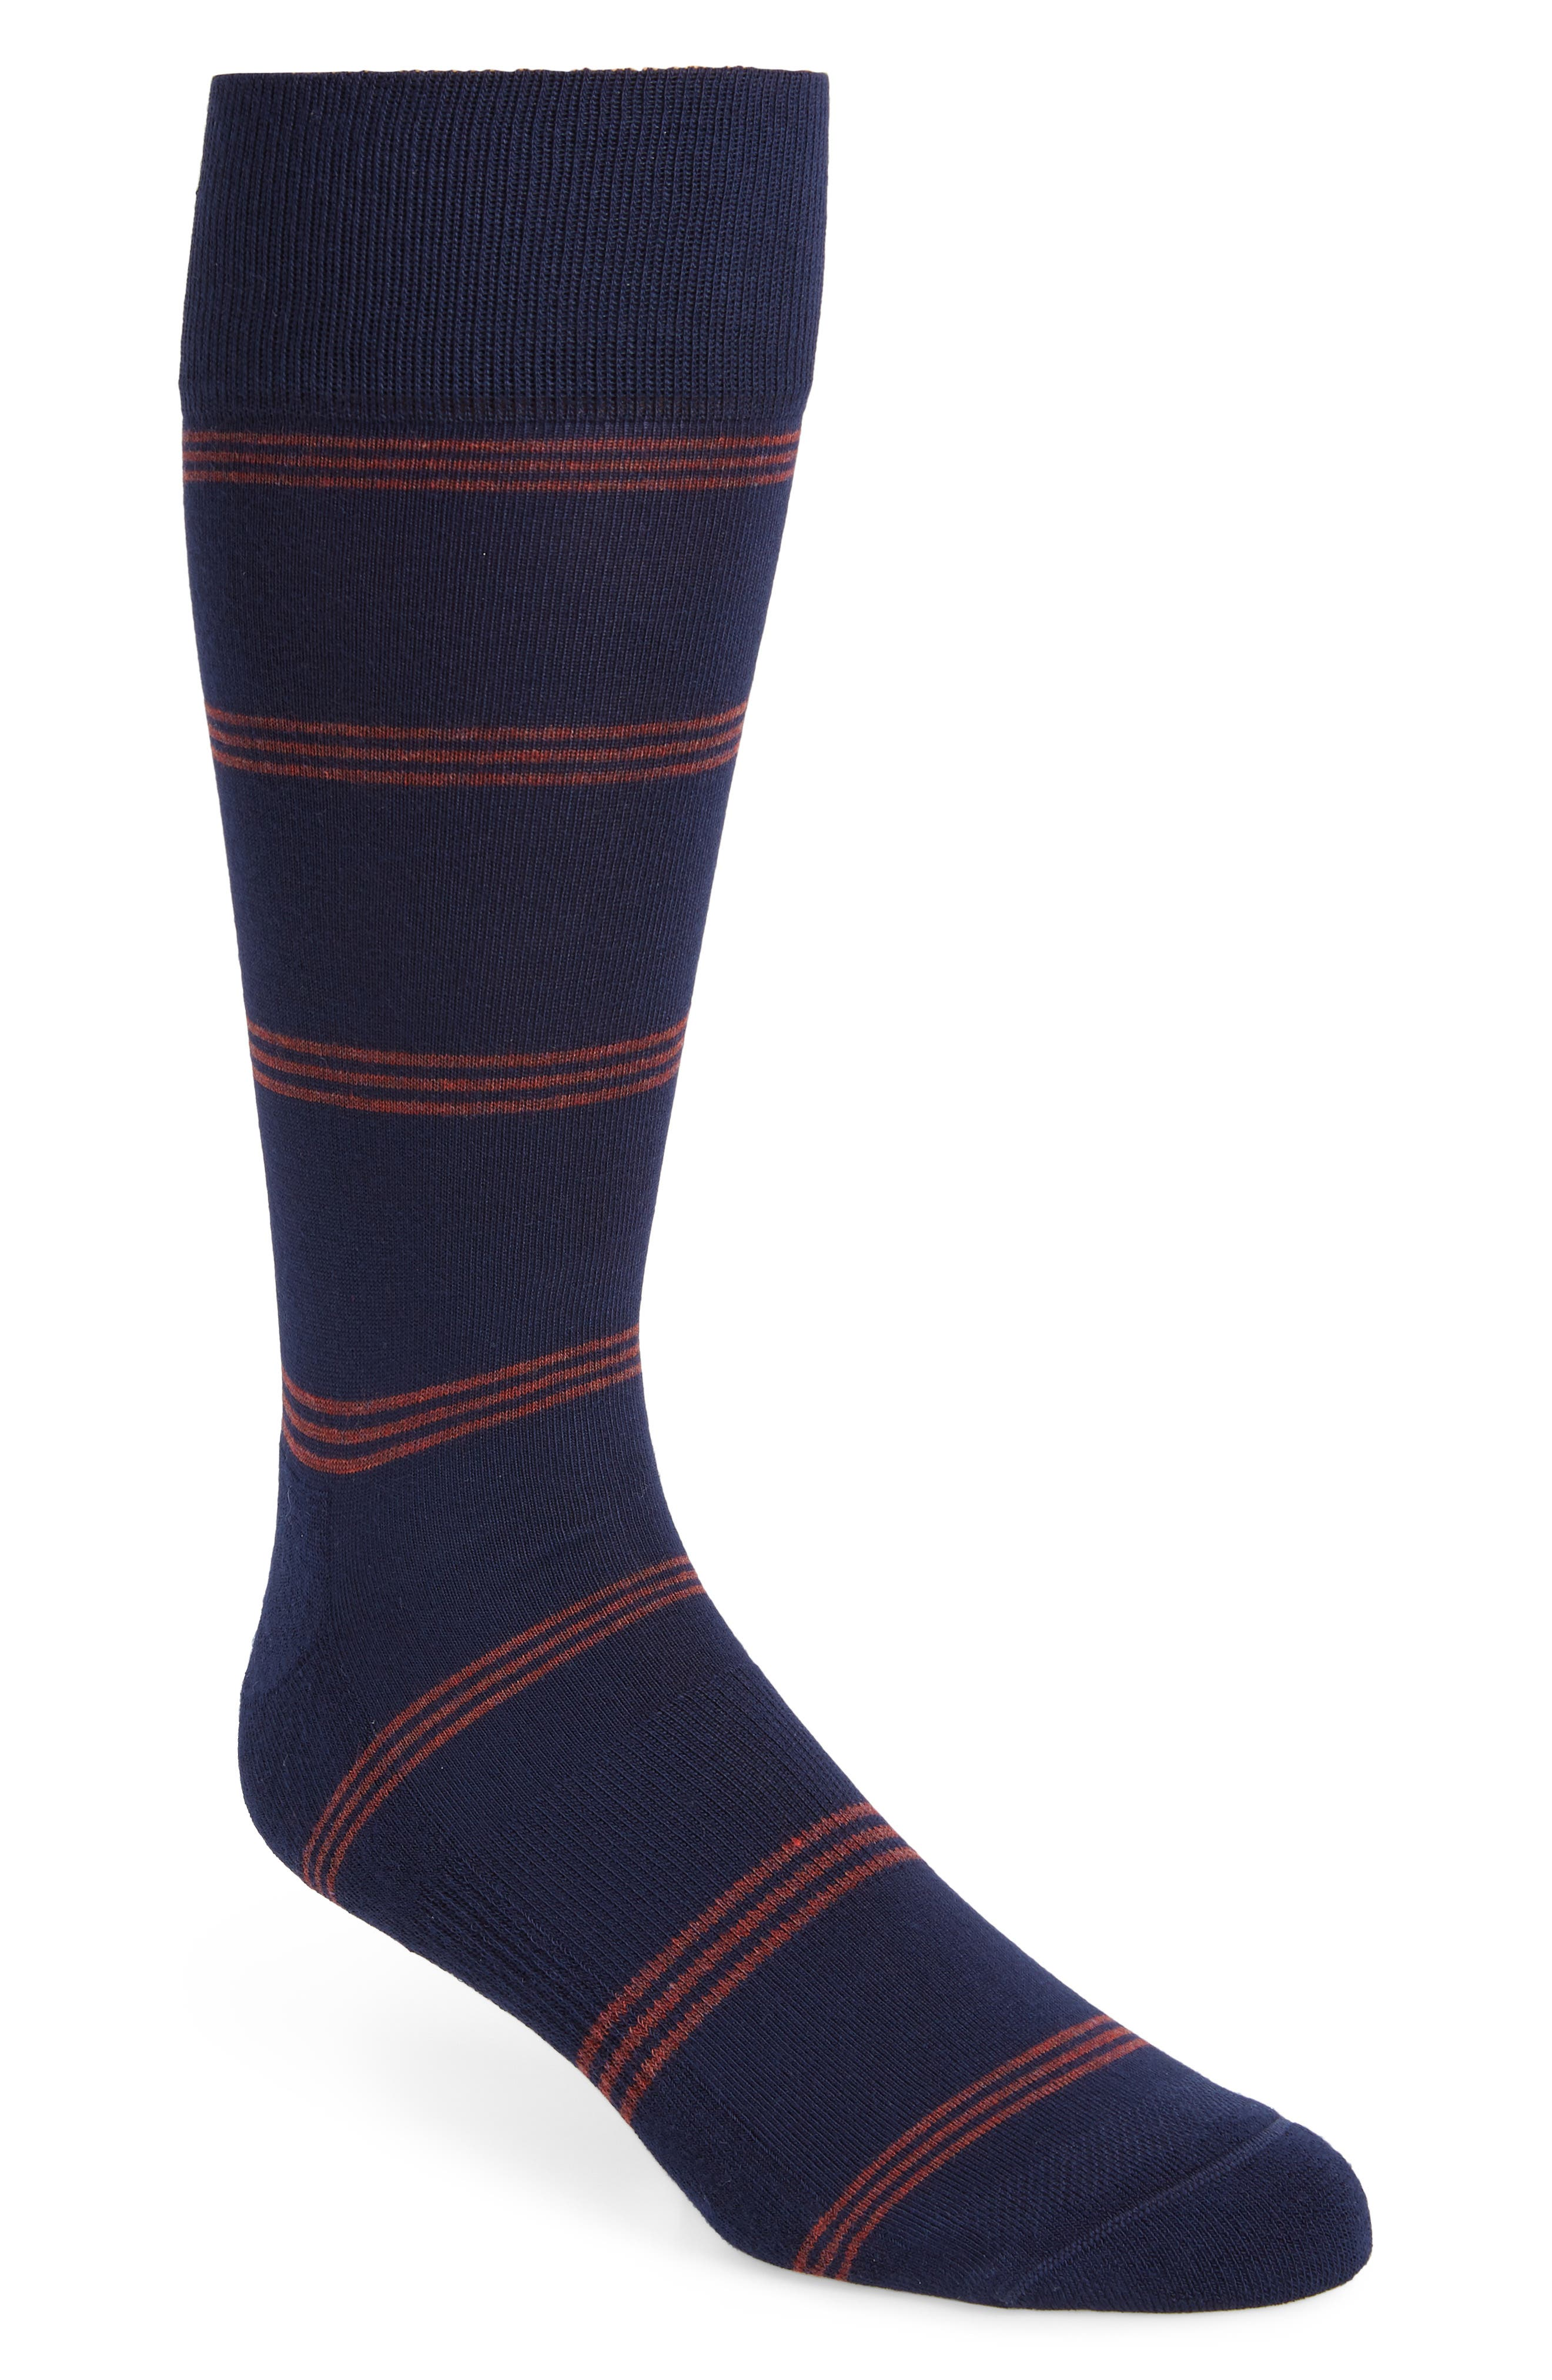 Triple Line Socks,                         Main,                         color,